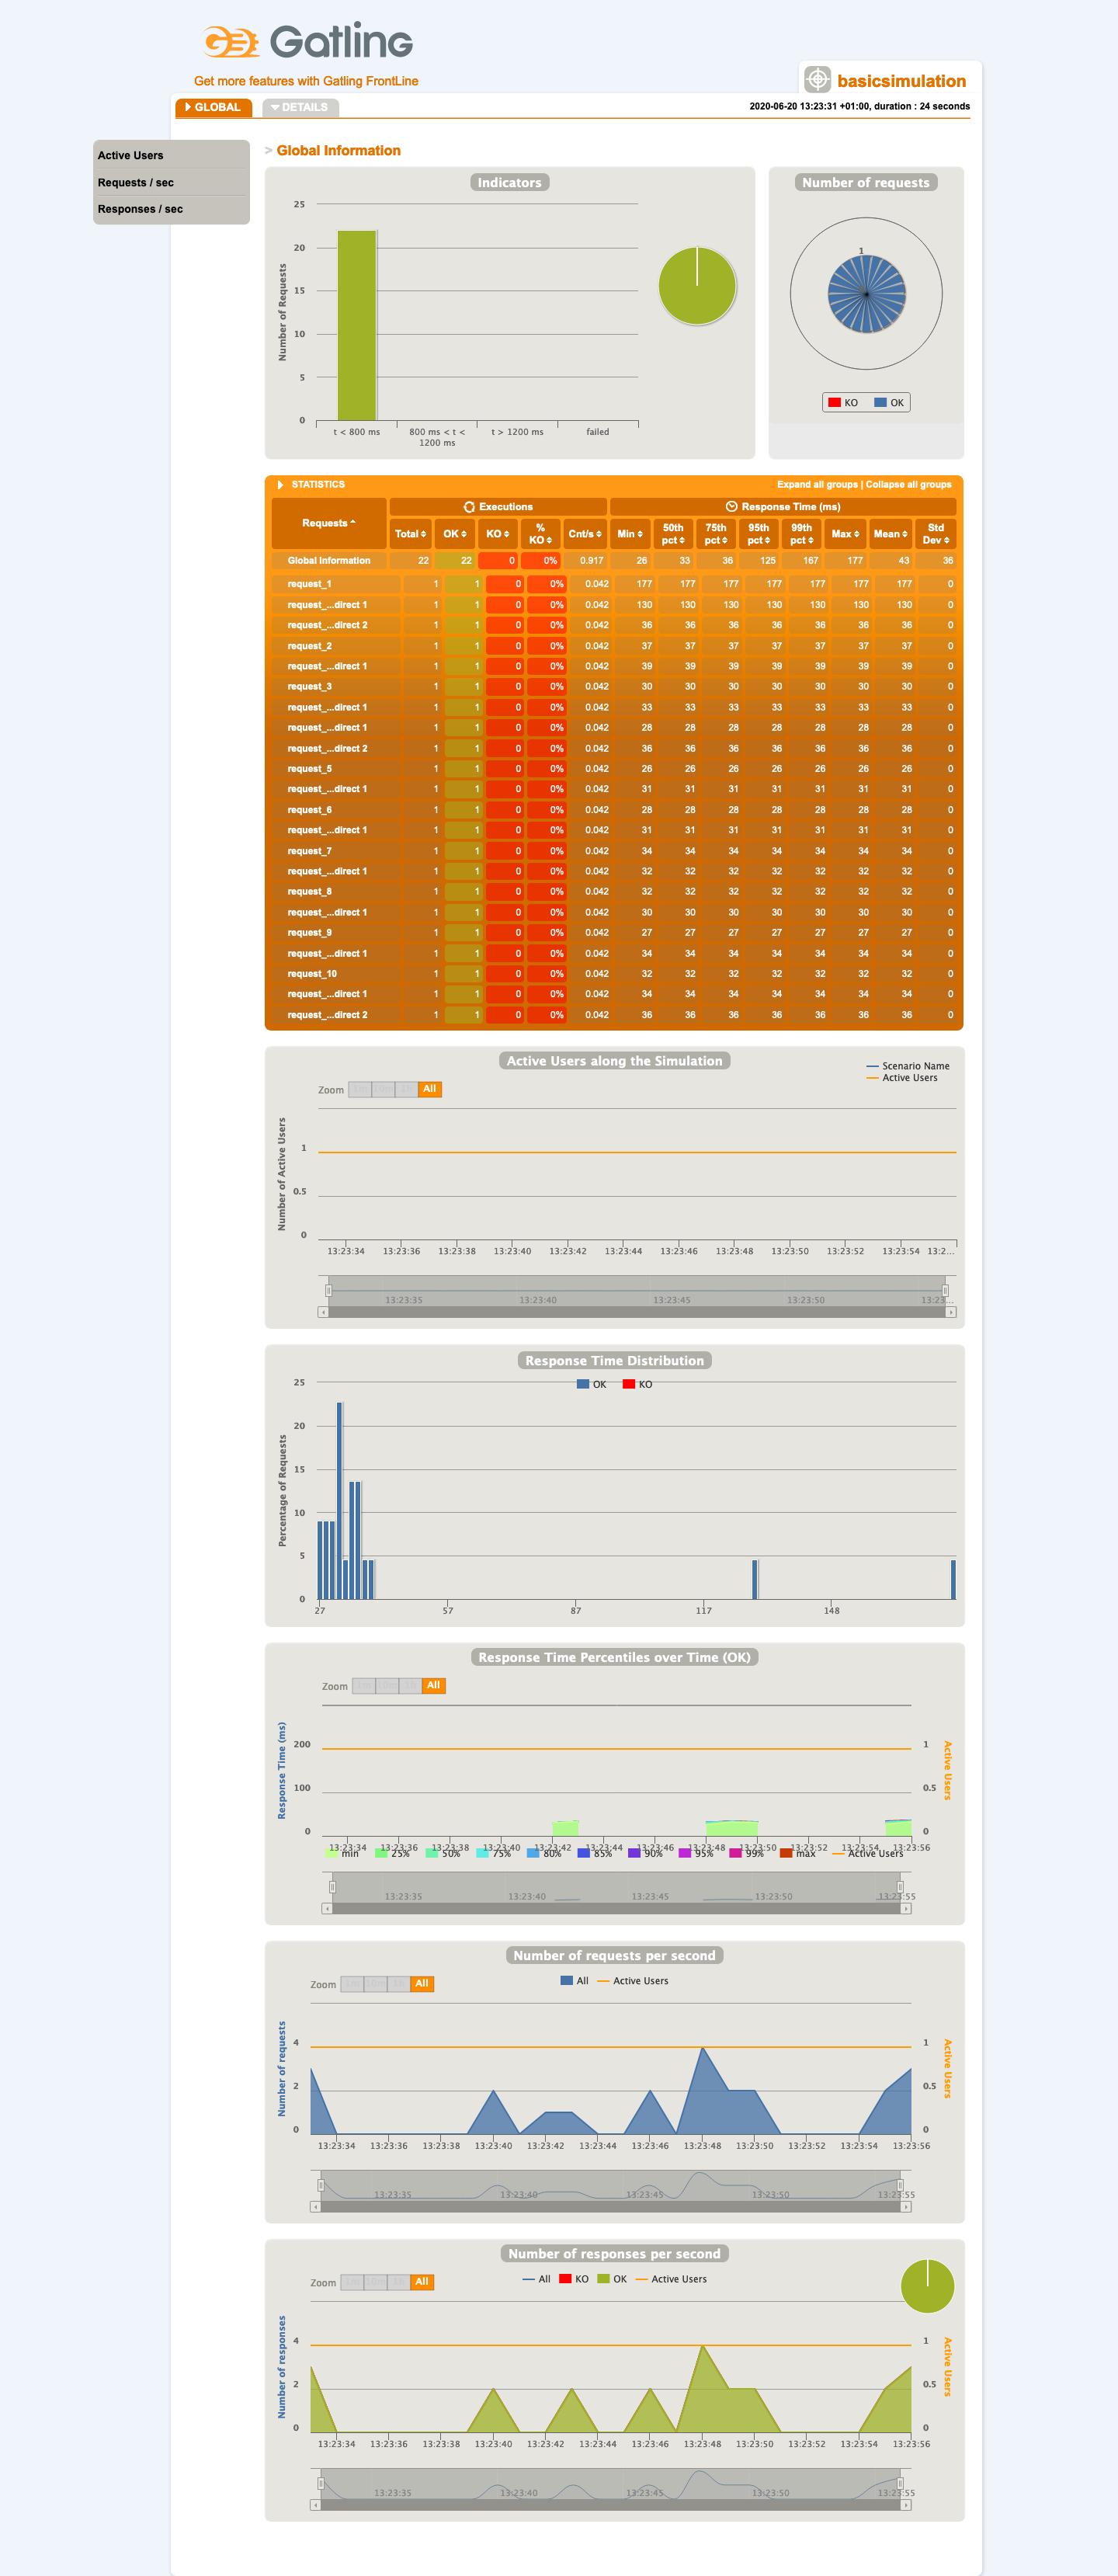 Screenshot_2020-06-20 Gatling Stats - Global Information